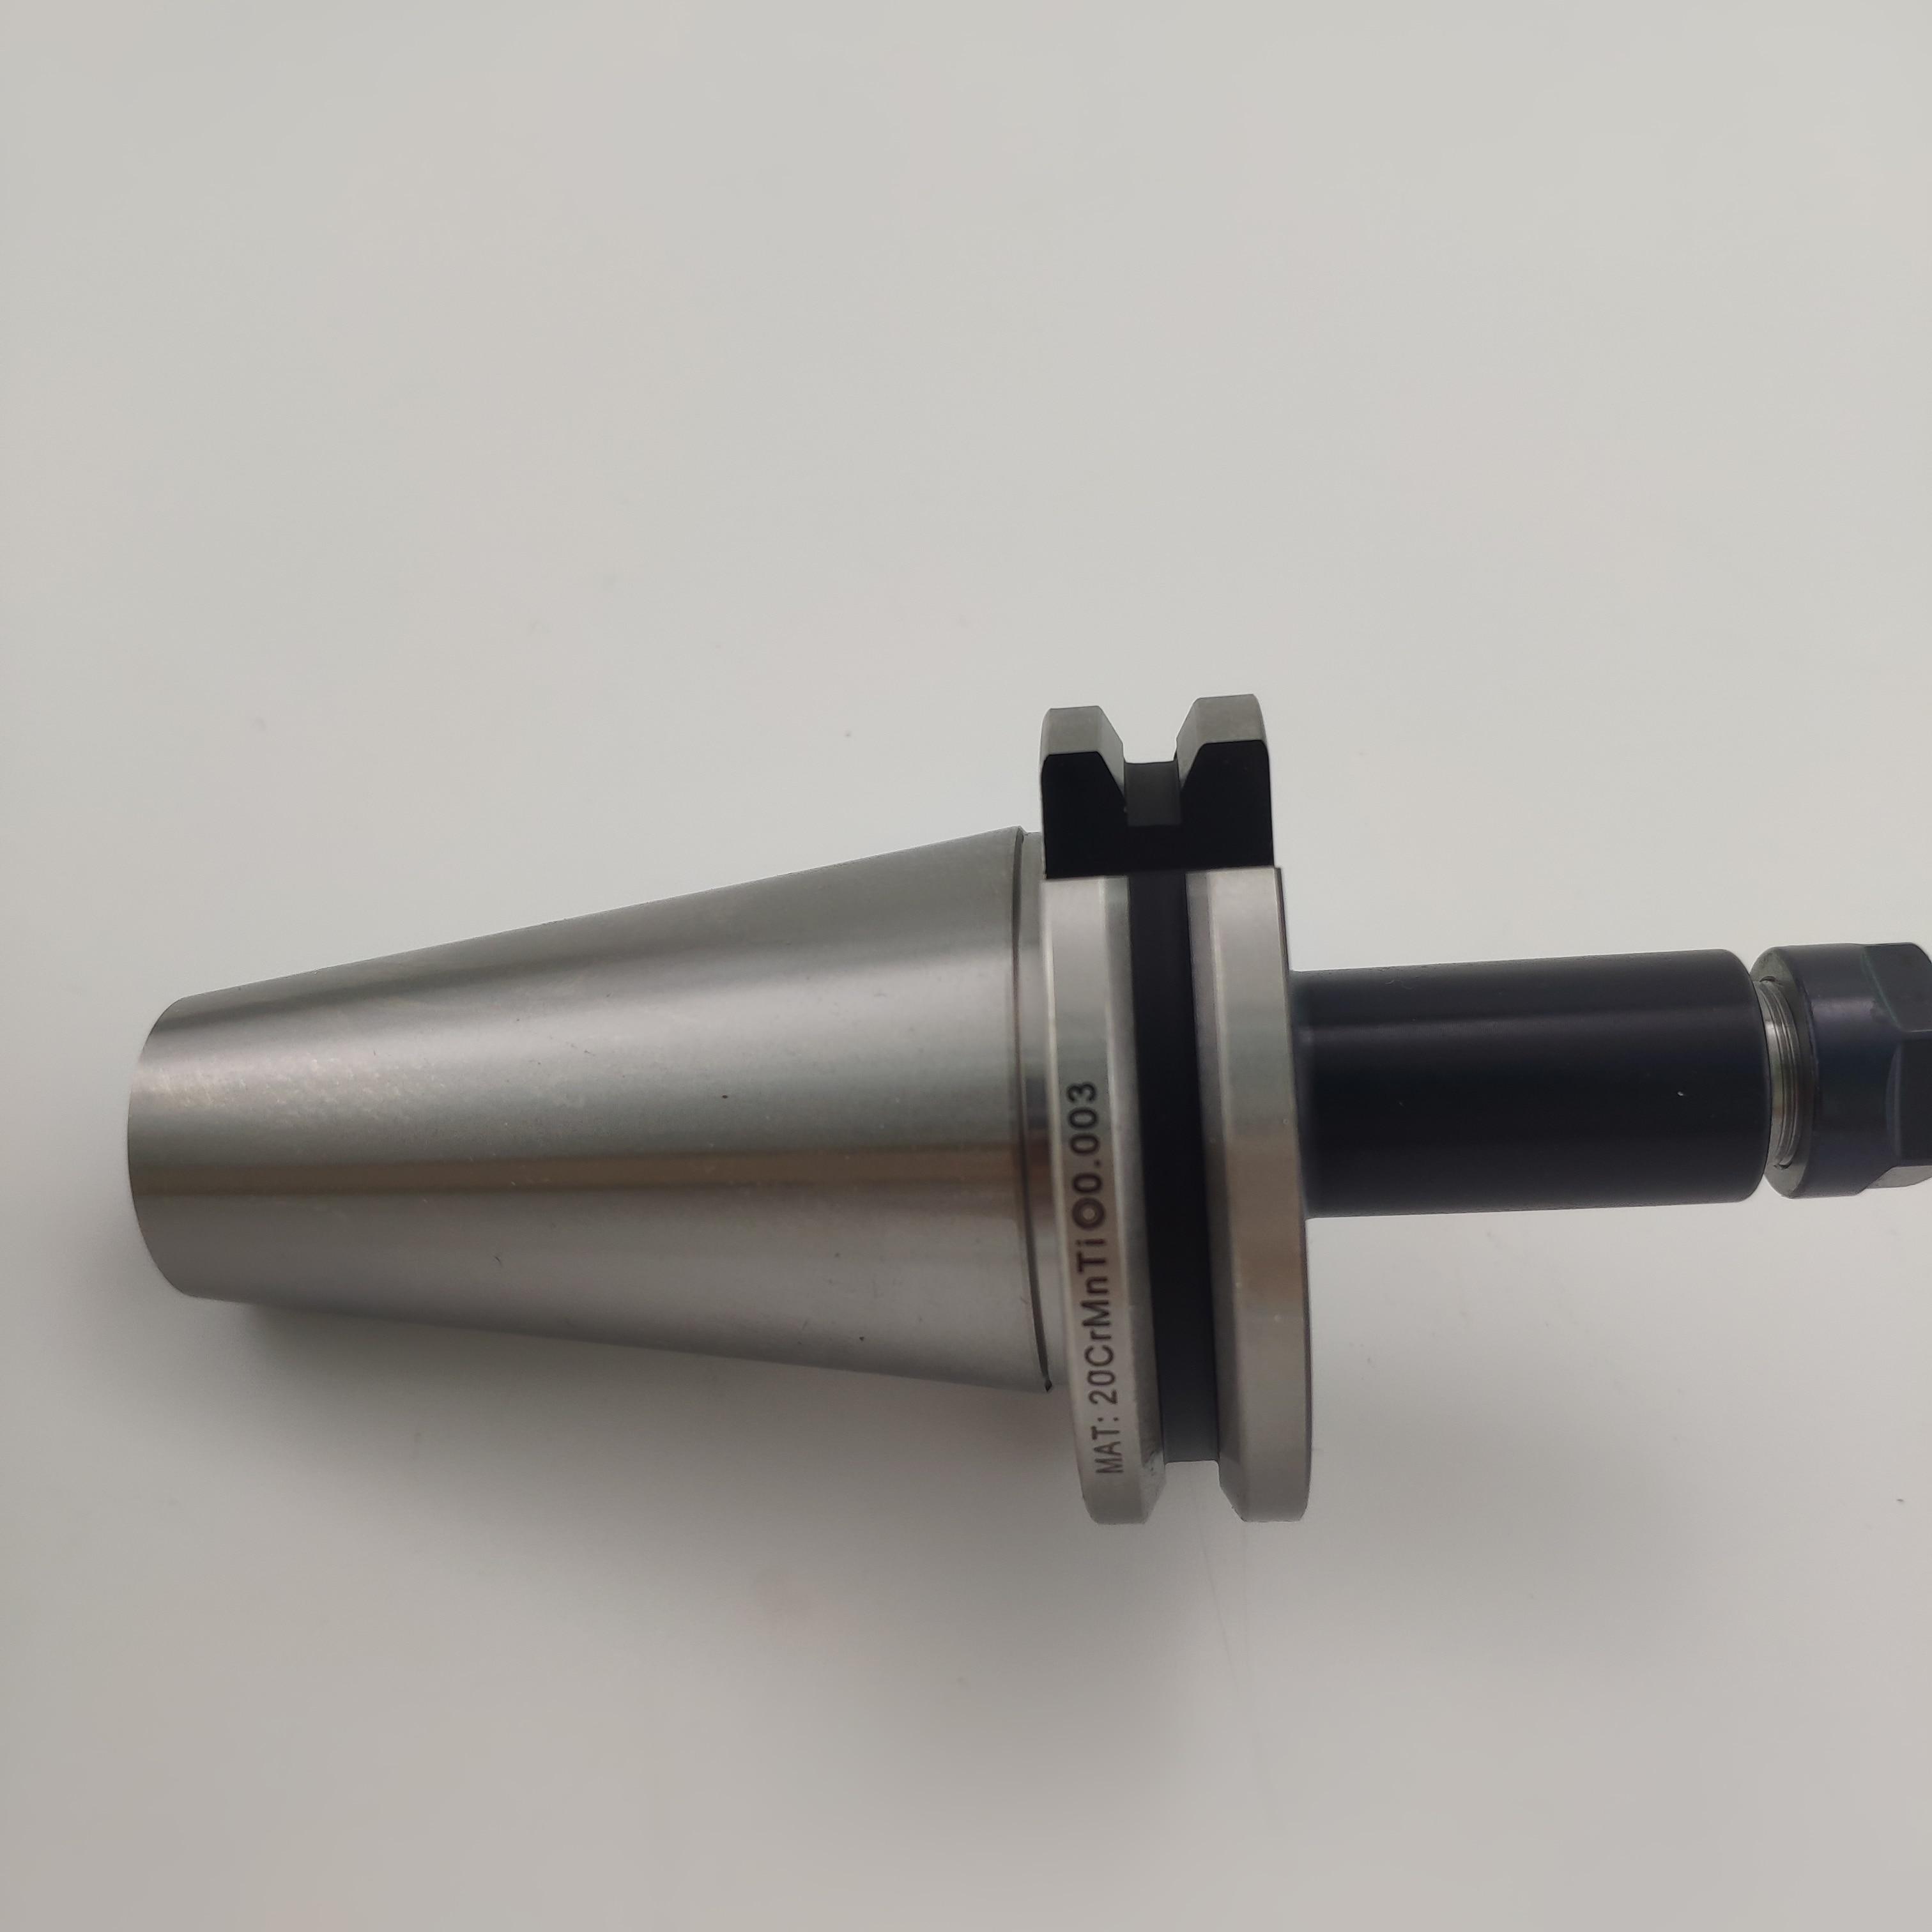 Фрезерный патрон Arbors DIN69871 SK40-ER11-70 патрон-держатель